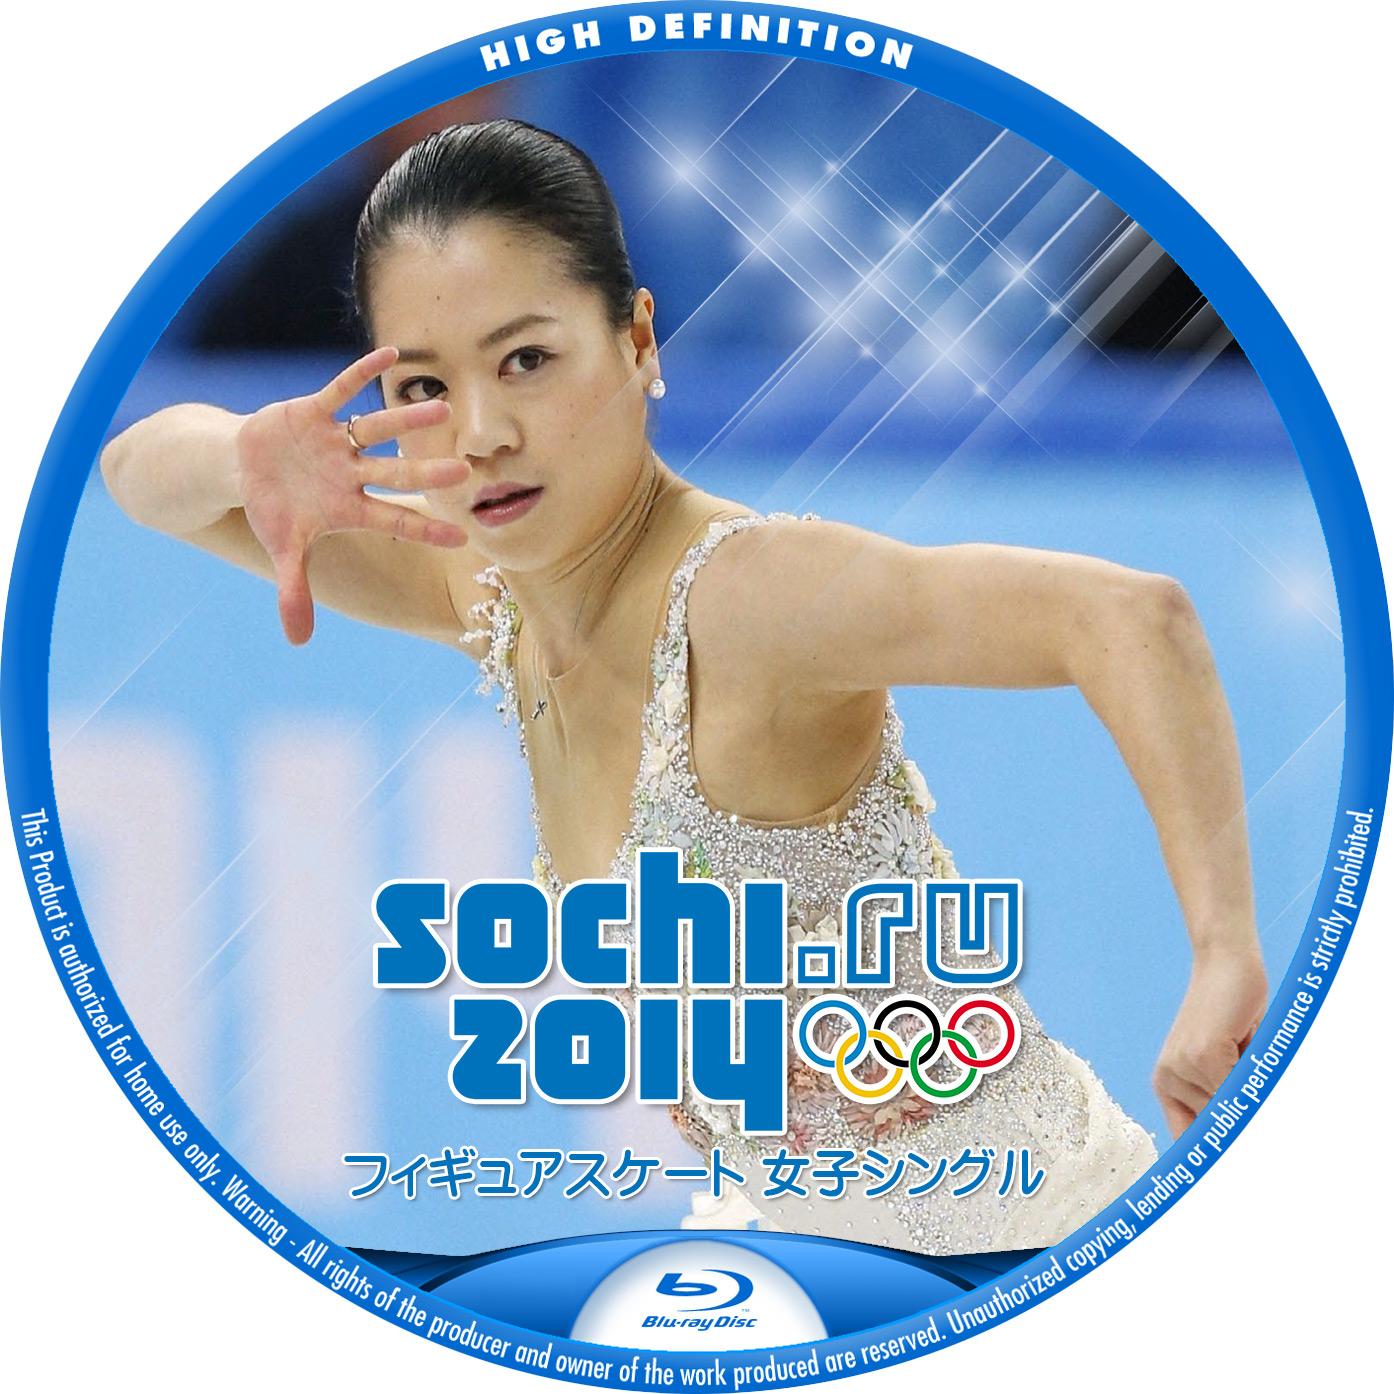 Sochi_Figure_Woens-BD4